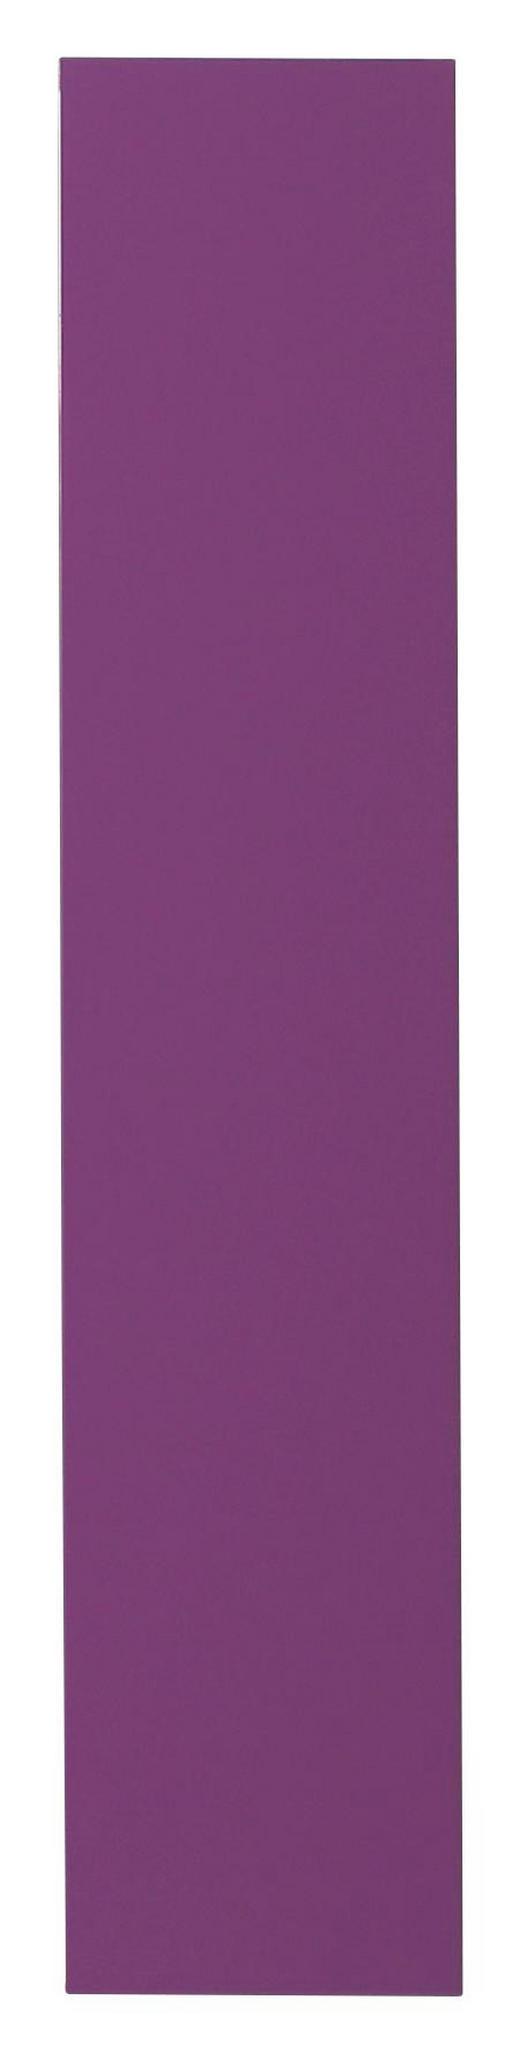 HÄNGEELEMENT in Lila - Lila, Design, Holz/Holzwerkstoff (139/29/31cm) - Carryhome